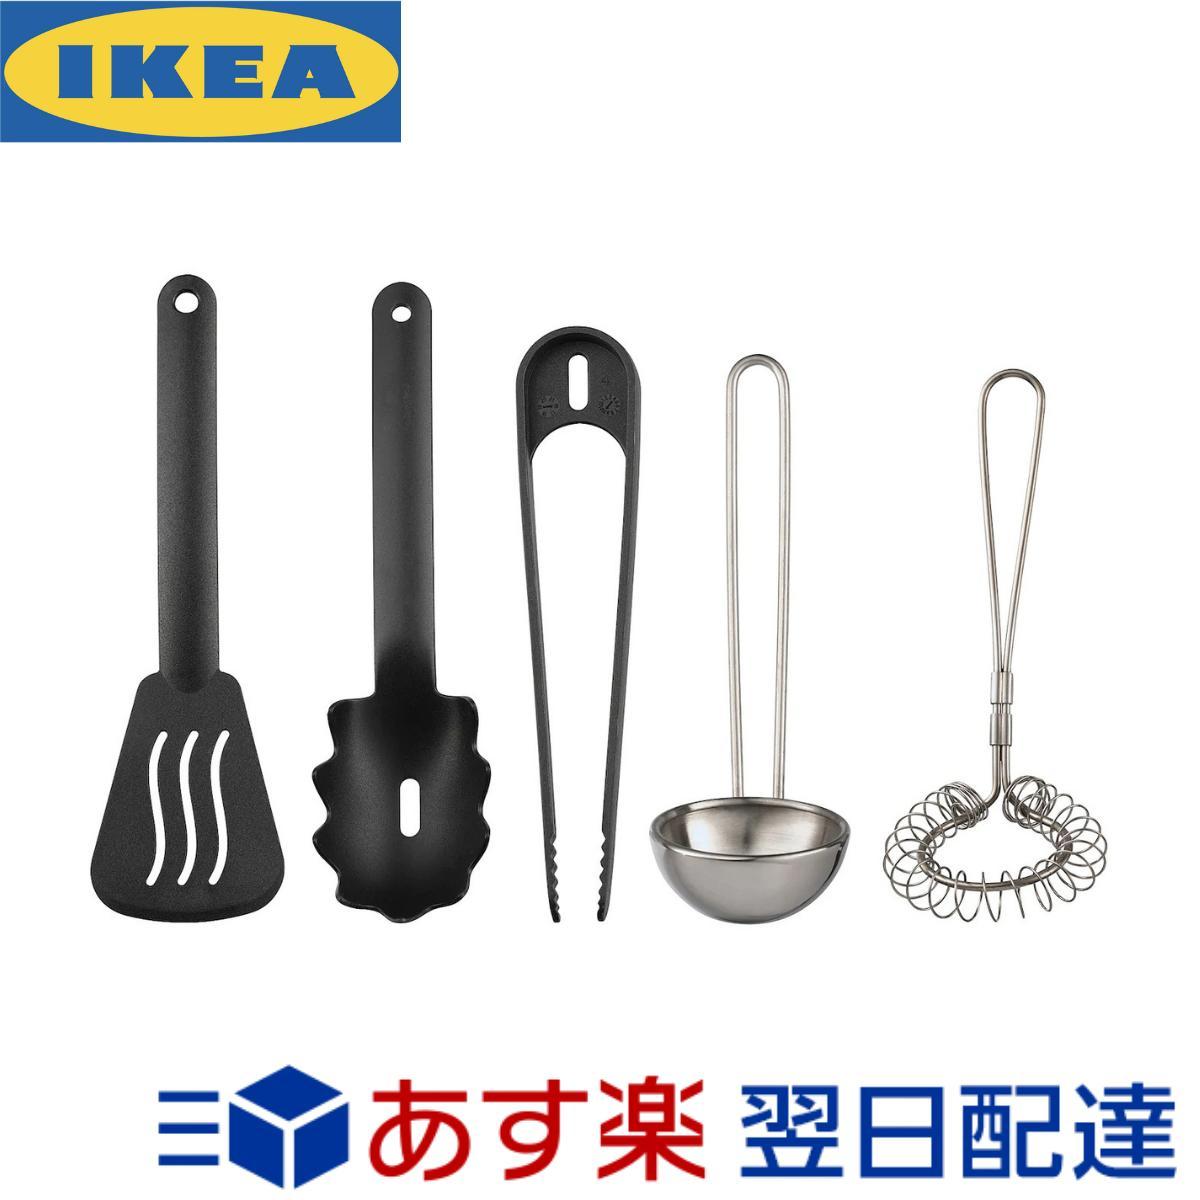 IKEA イケア DUKTIG 80157841 キッチン用品5点セット マルチカラー